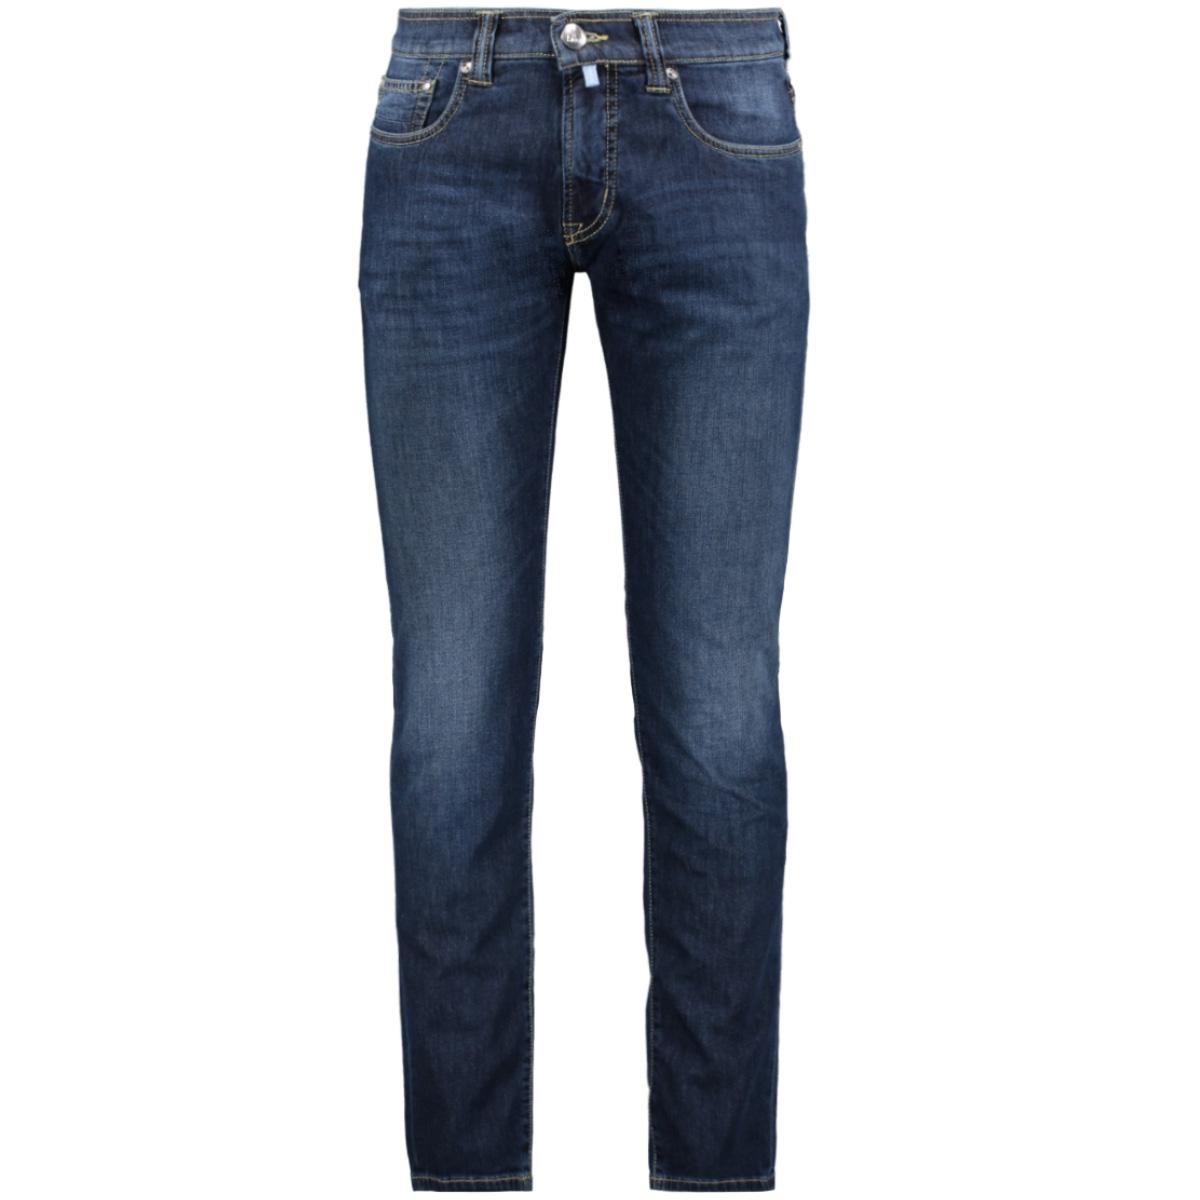 antibes 30031 1500 pierre cardin jeans 47